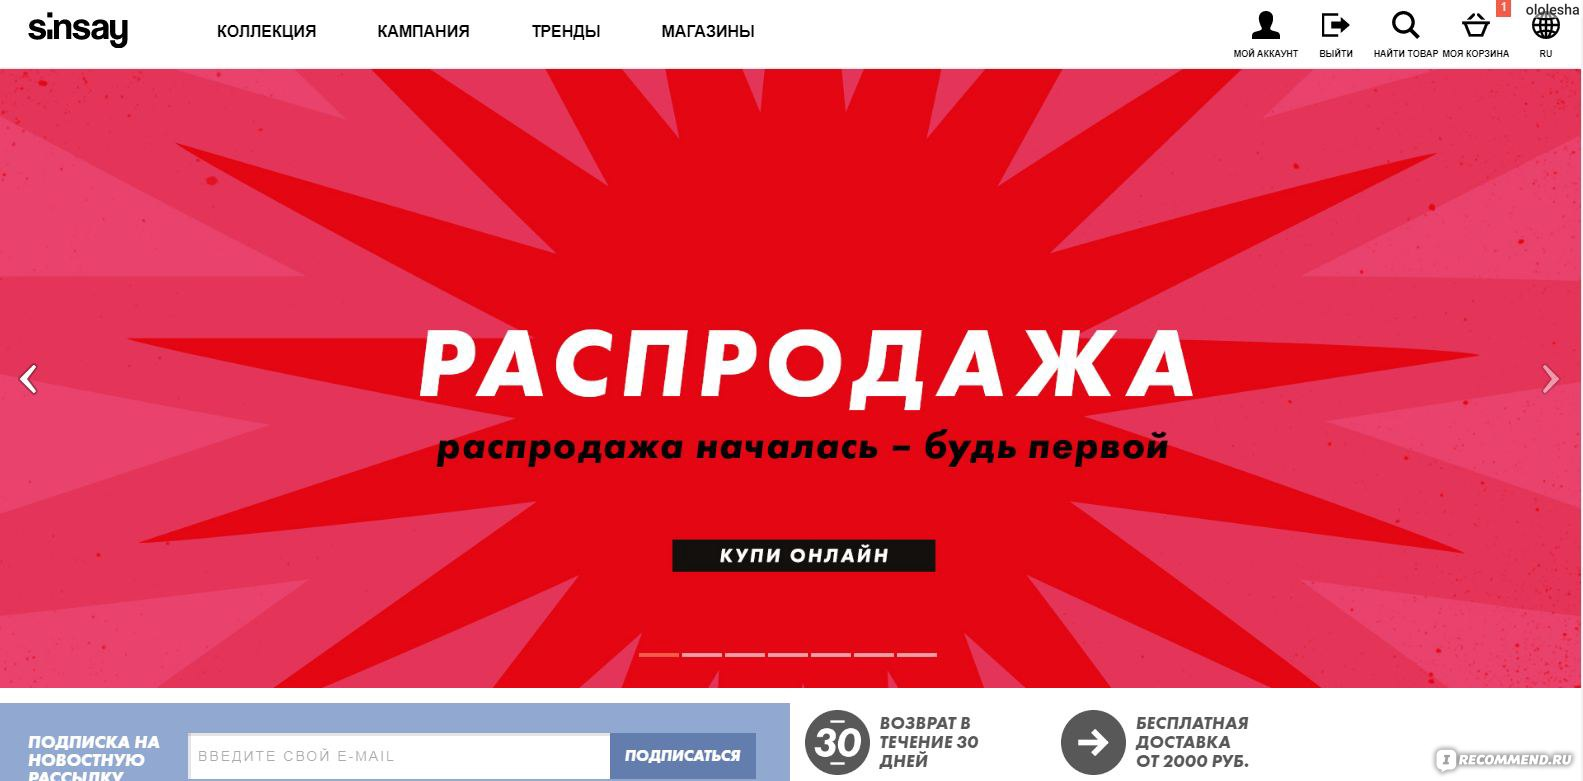 415ffbc8acee Сайт Sinsay - интернет магазин/ Sin-say.com/ru/ru/ - «Интернет ...